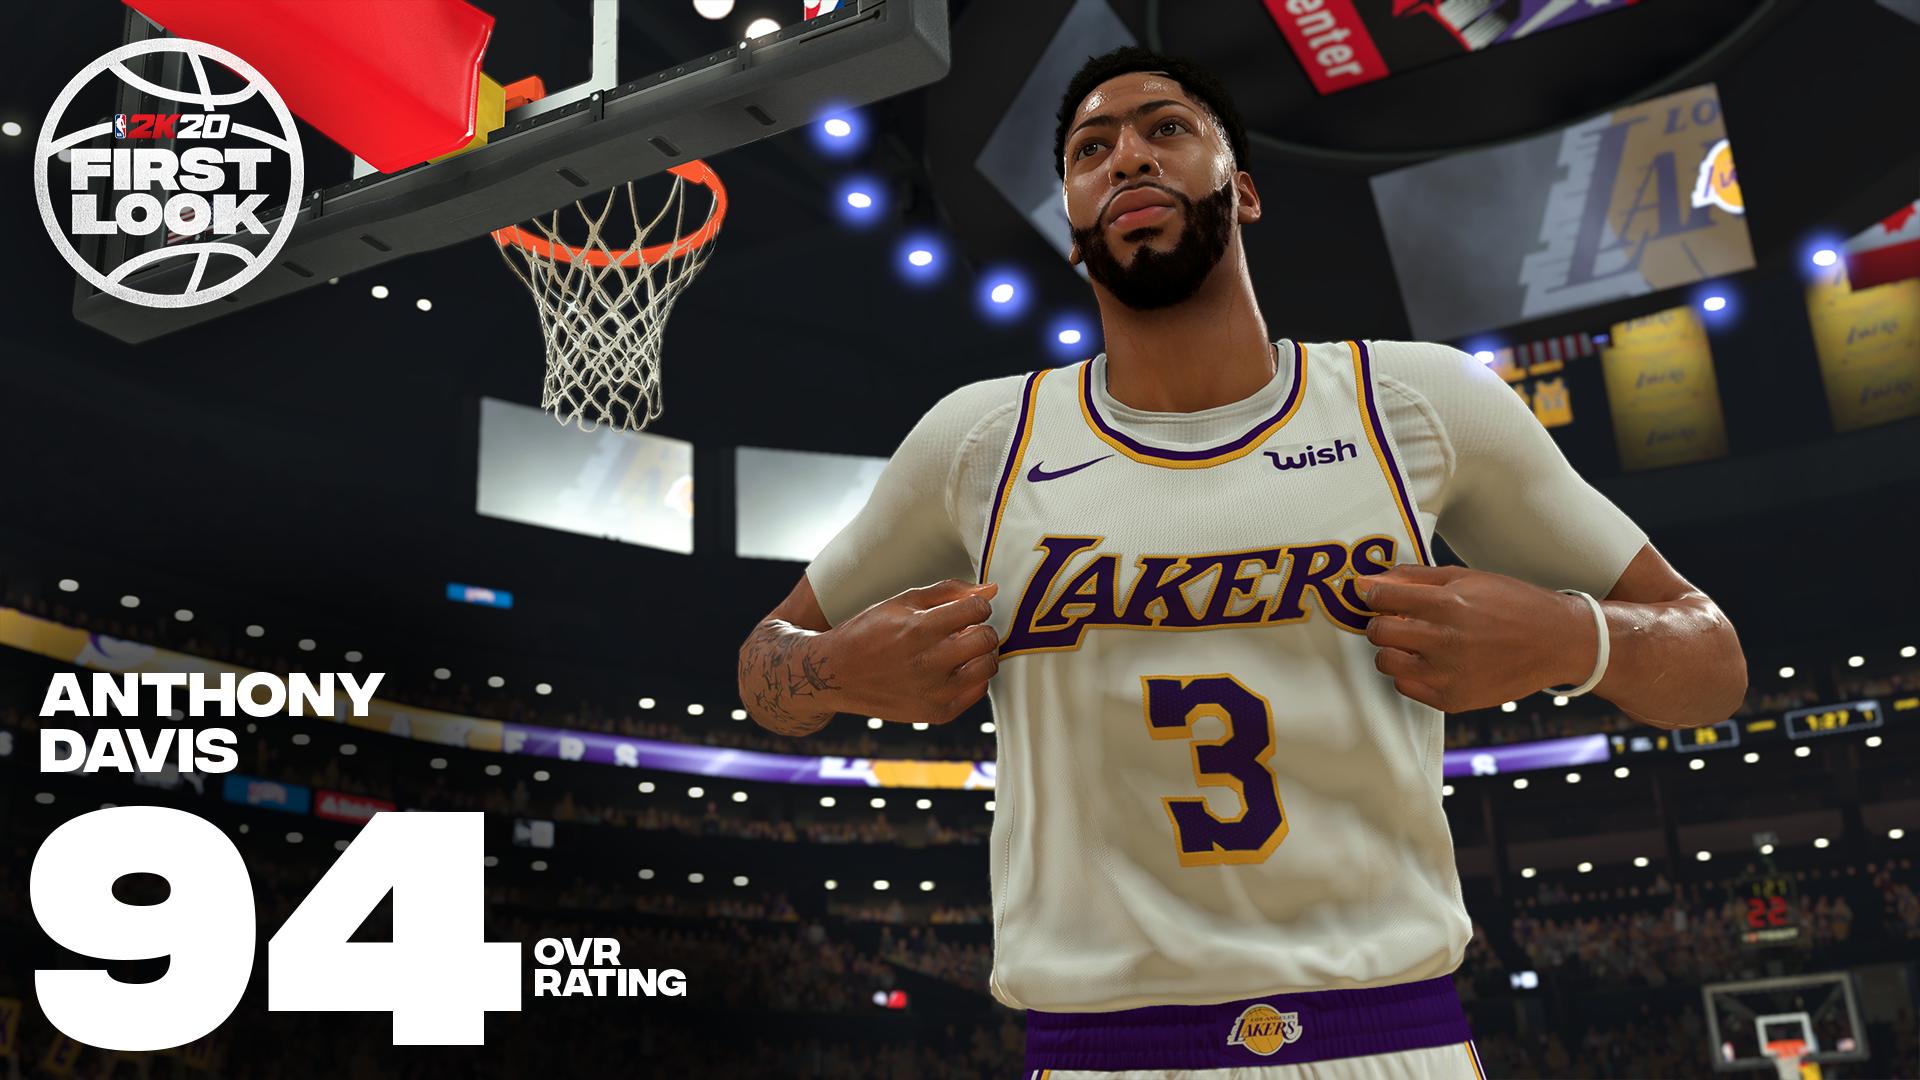 《NBA 2K20》明星球员评分公布!老詹连续10年评分最高 第10张